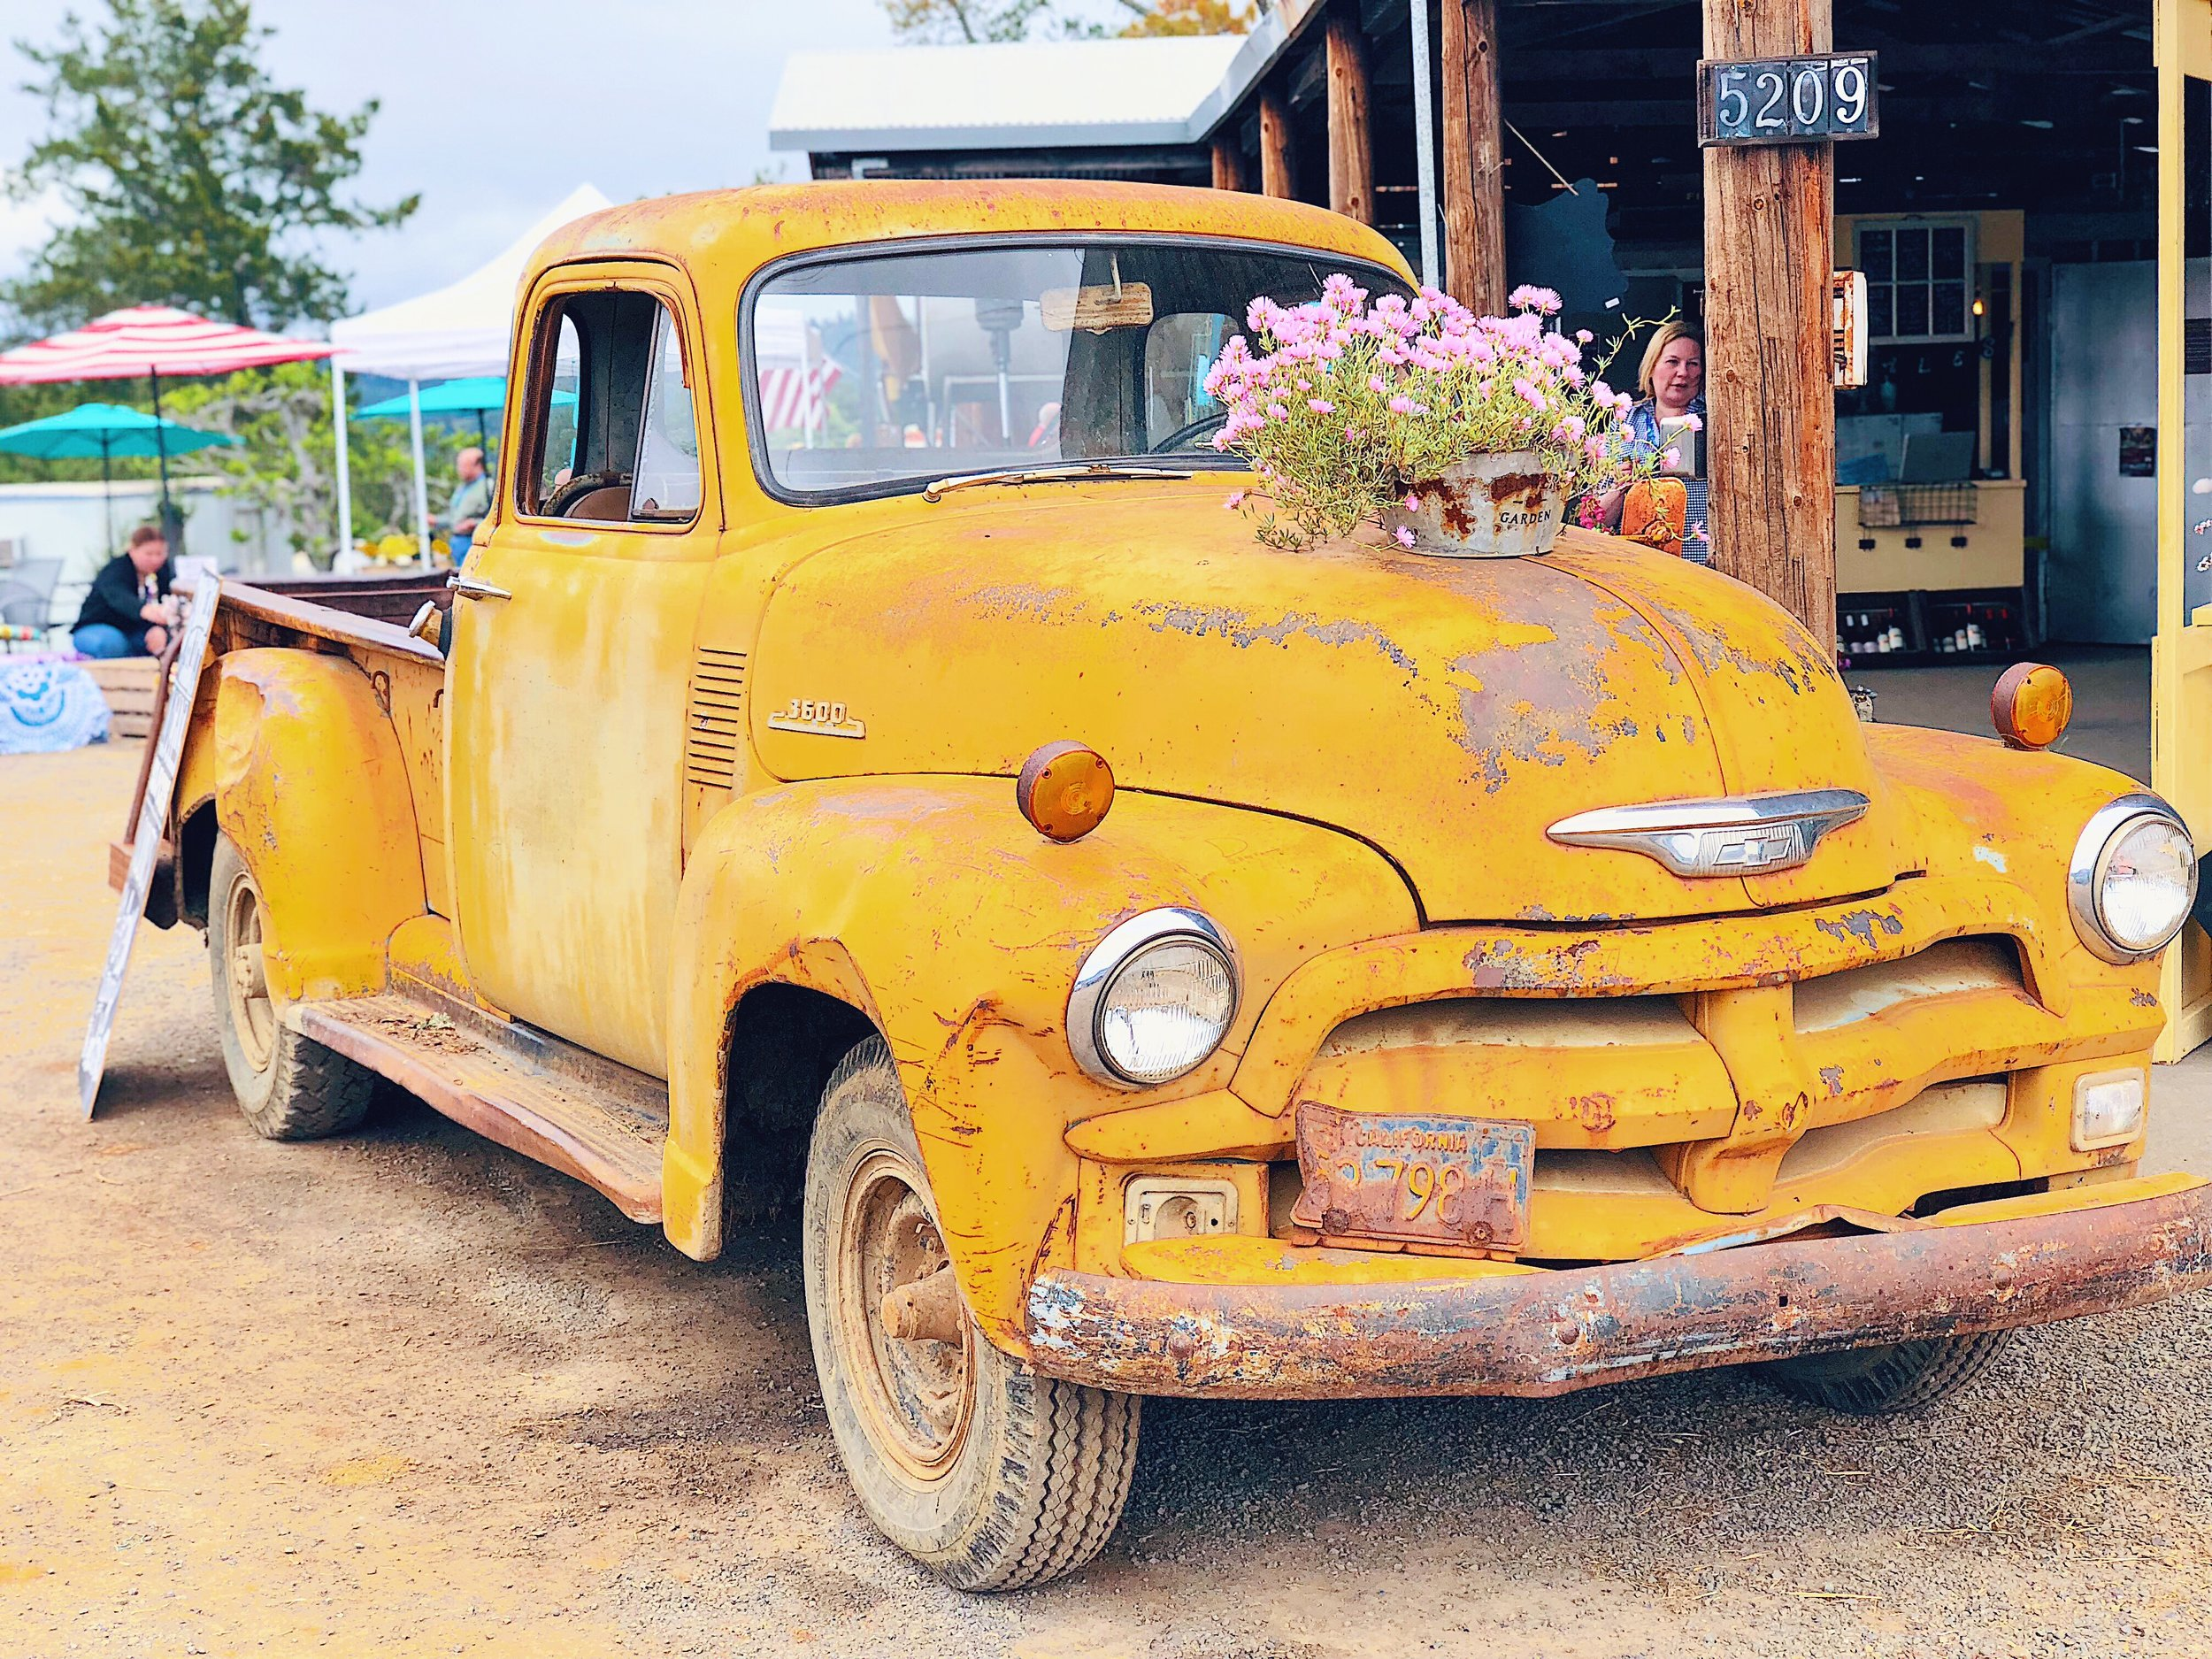 Vintage Truck Mounts Winery